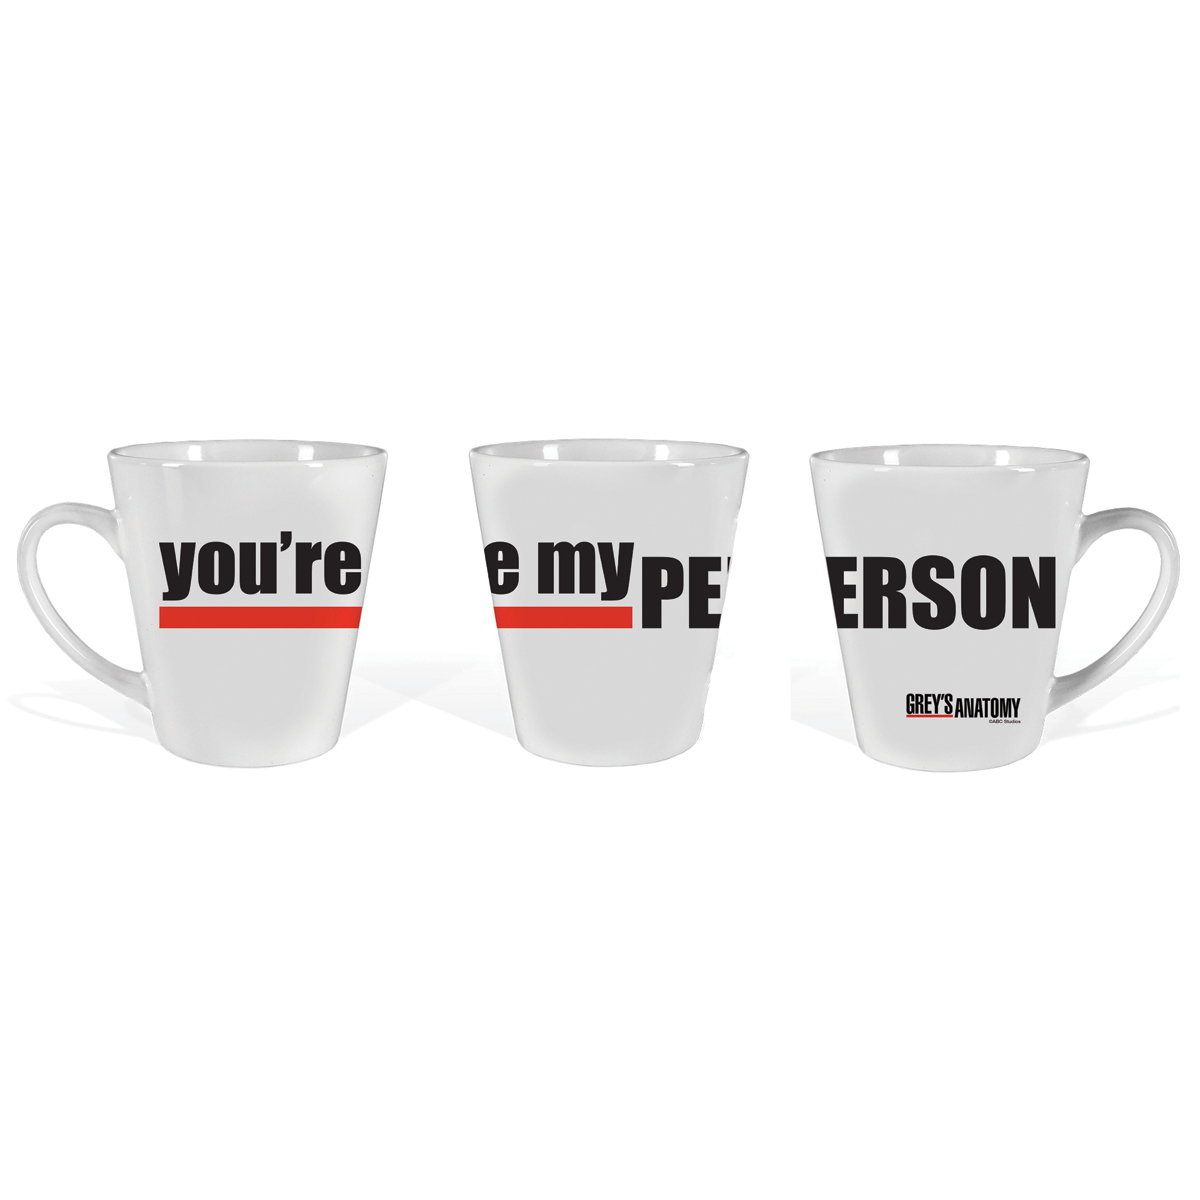 Grey's Anatomy You're My Person Latte Mug